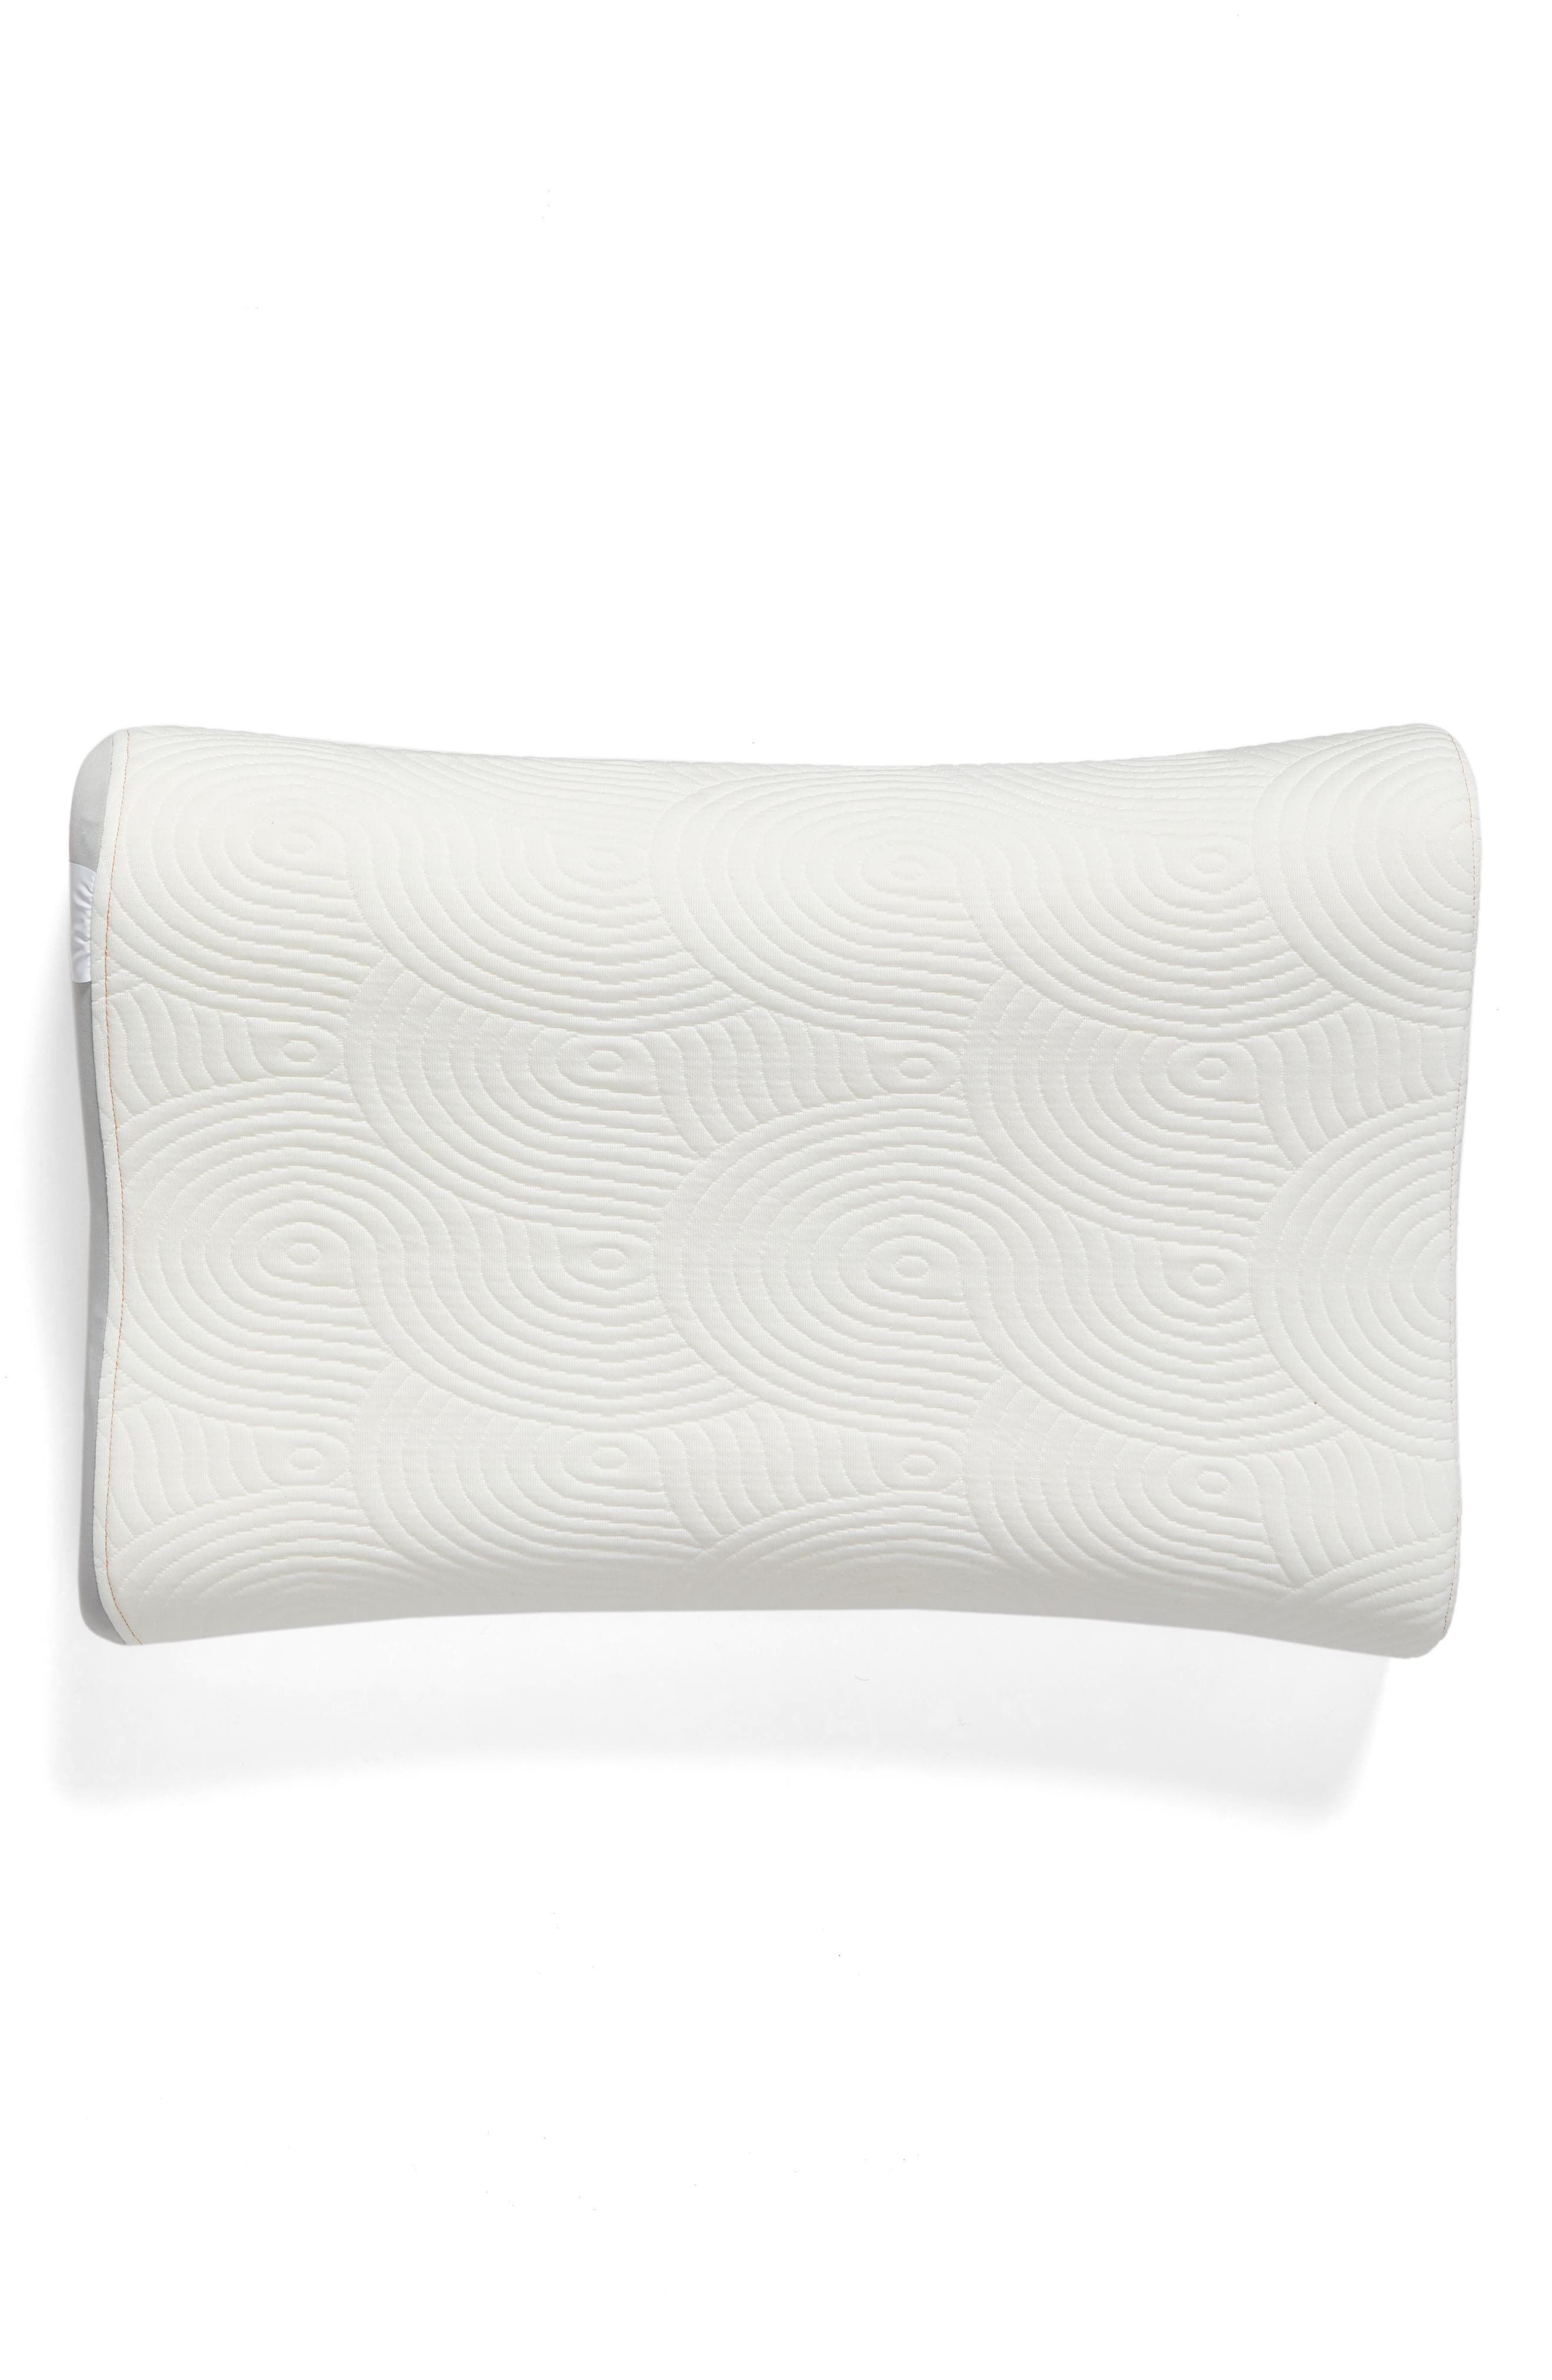 TEMPUR-Contour Side-to-Side Pillow,                             Main thumbnail 1, color,                             WHITE